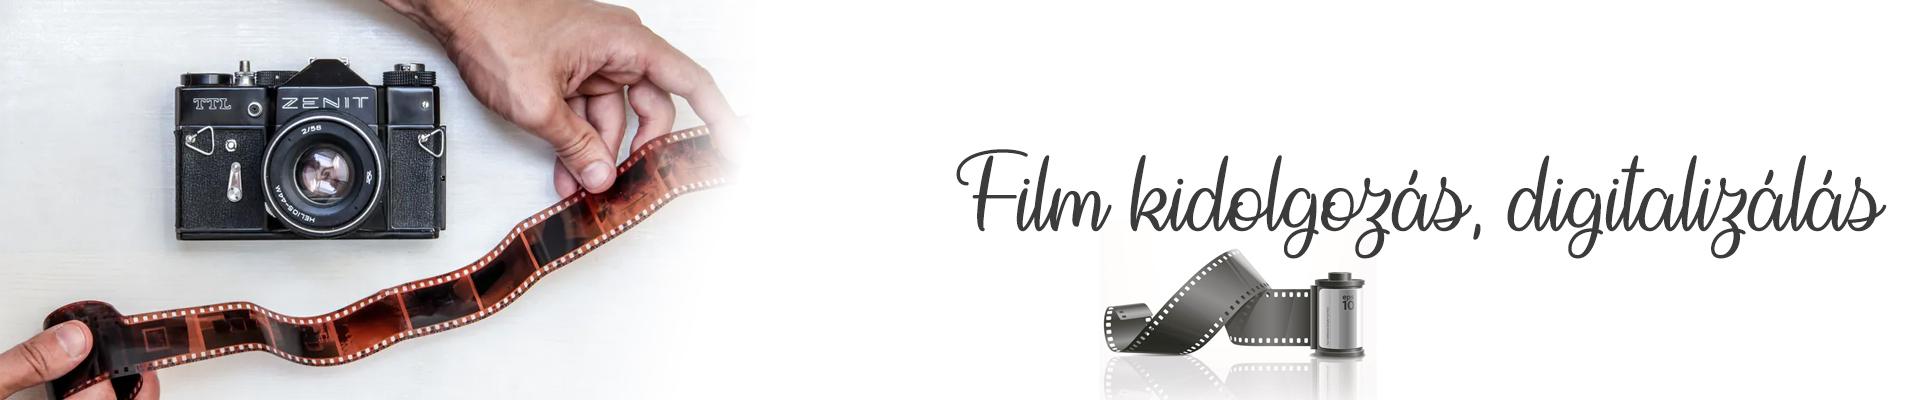 filmkidolgozas digitalizalas